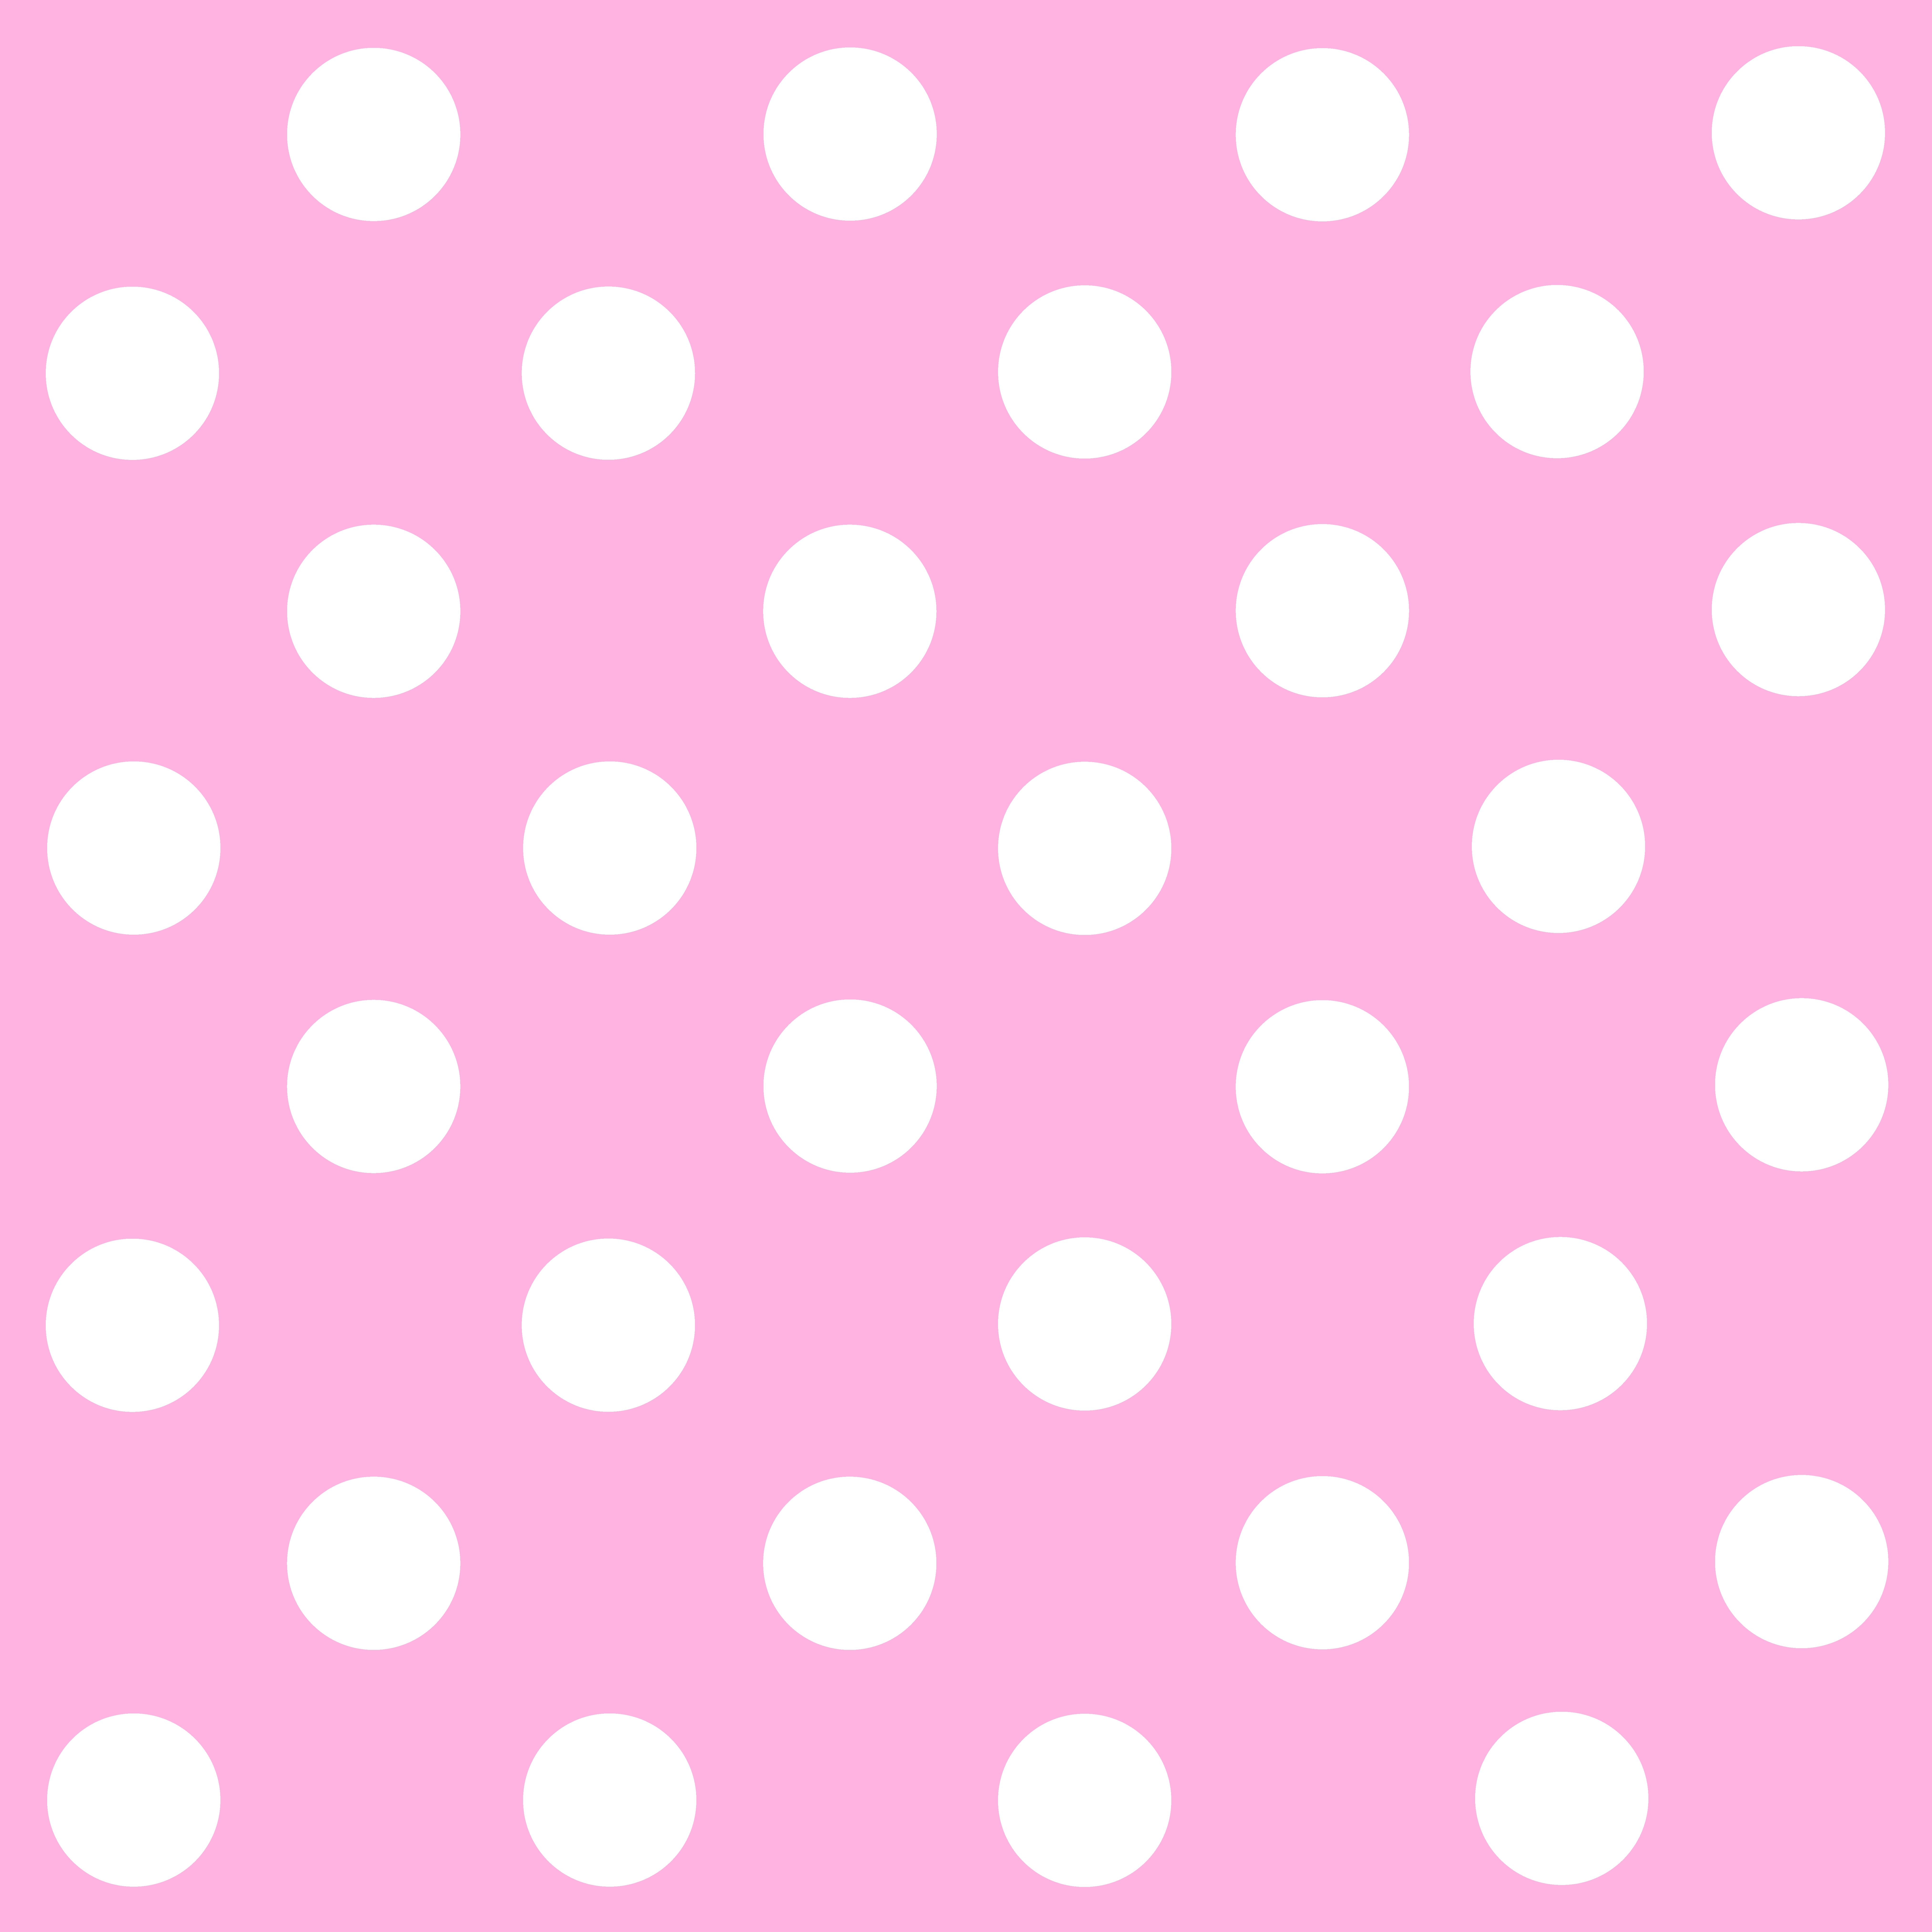 Dot clipart pink.  polka clip art